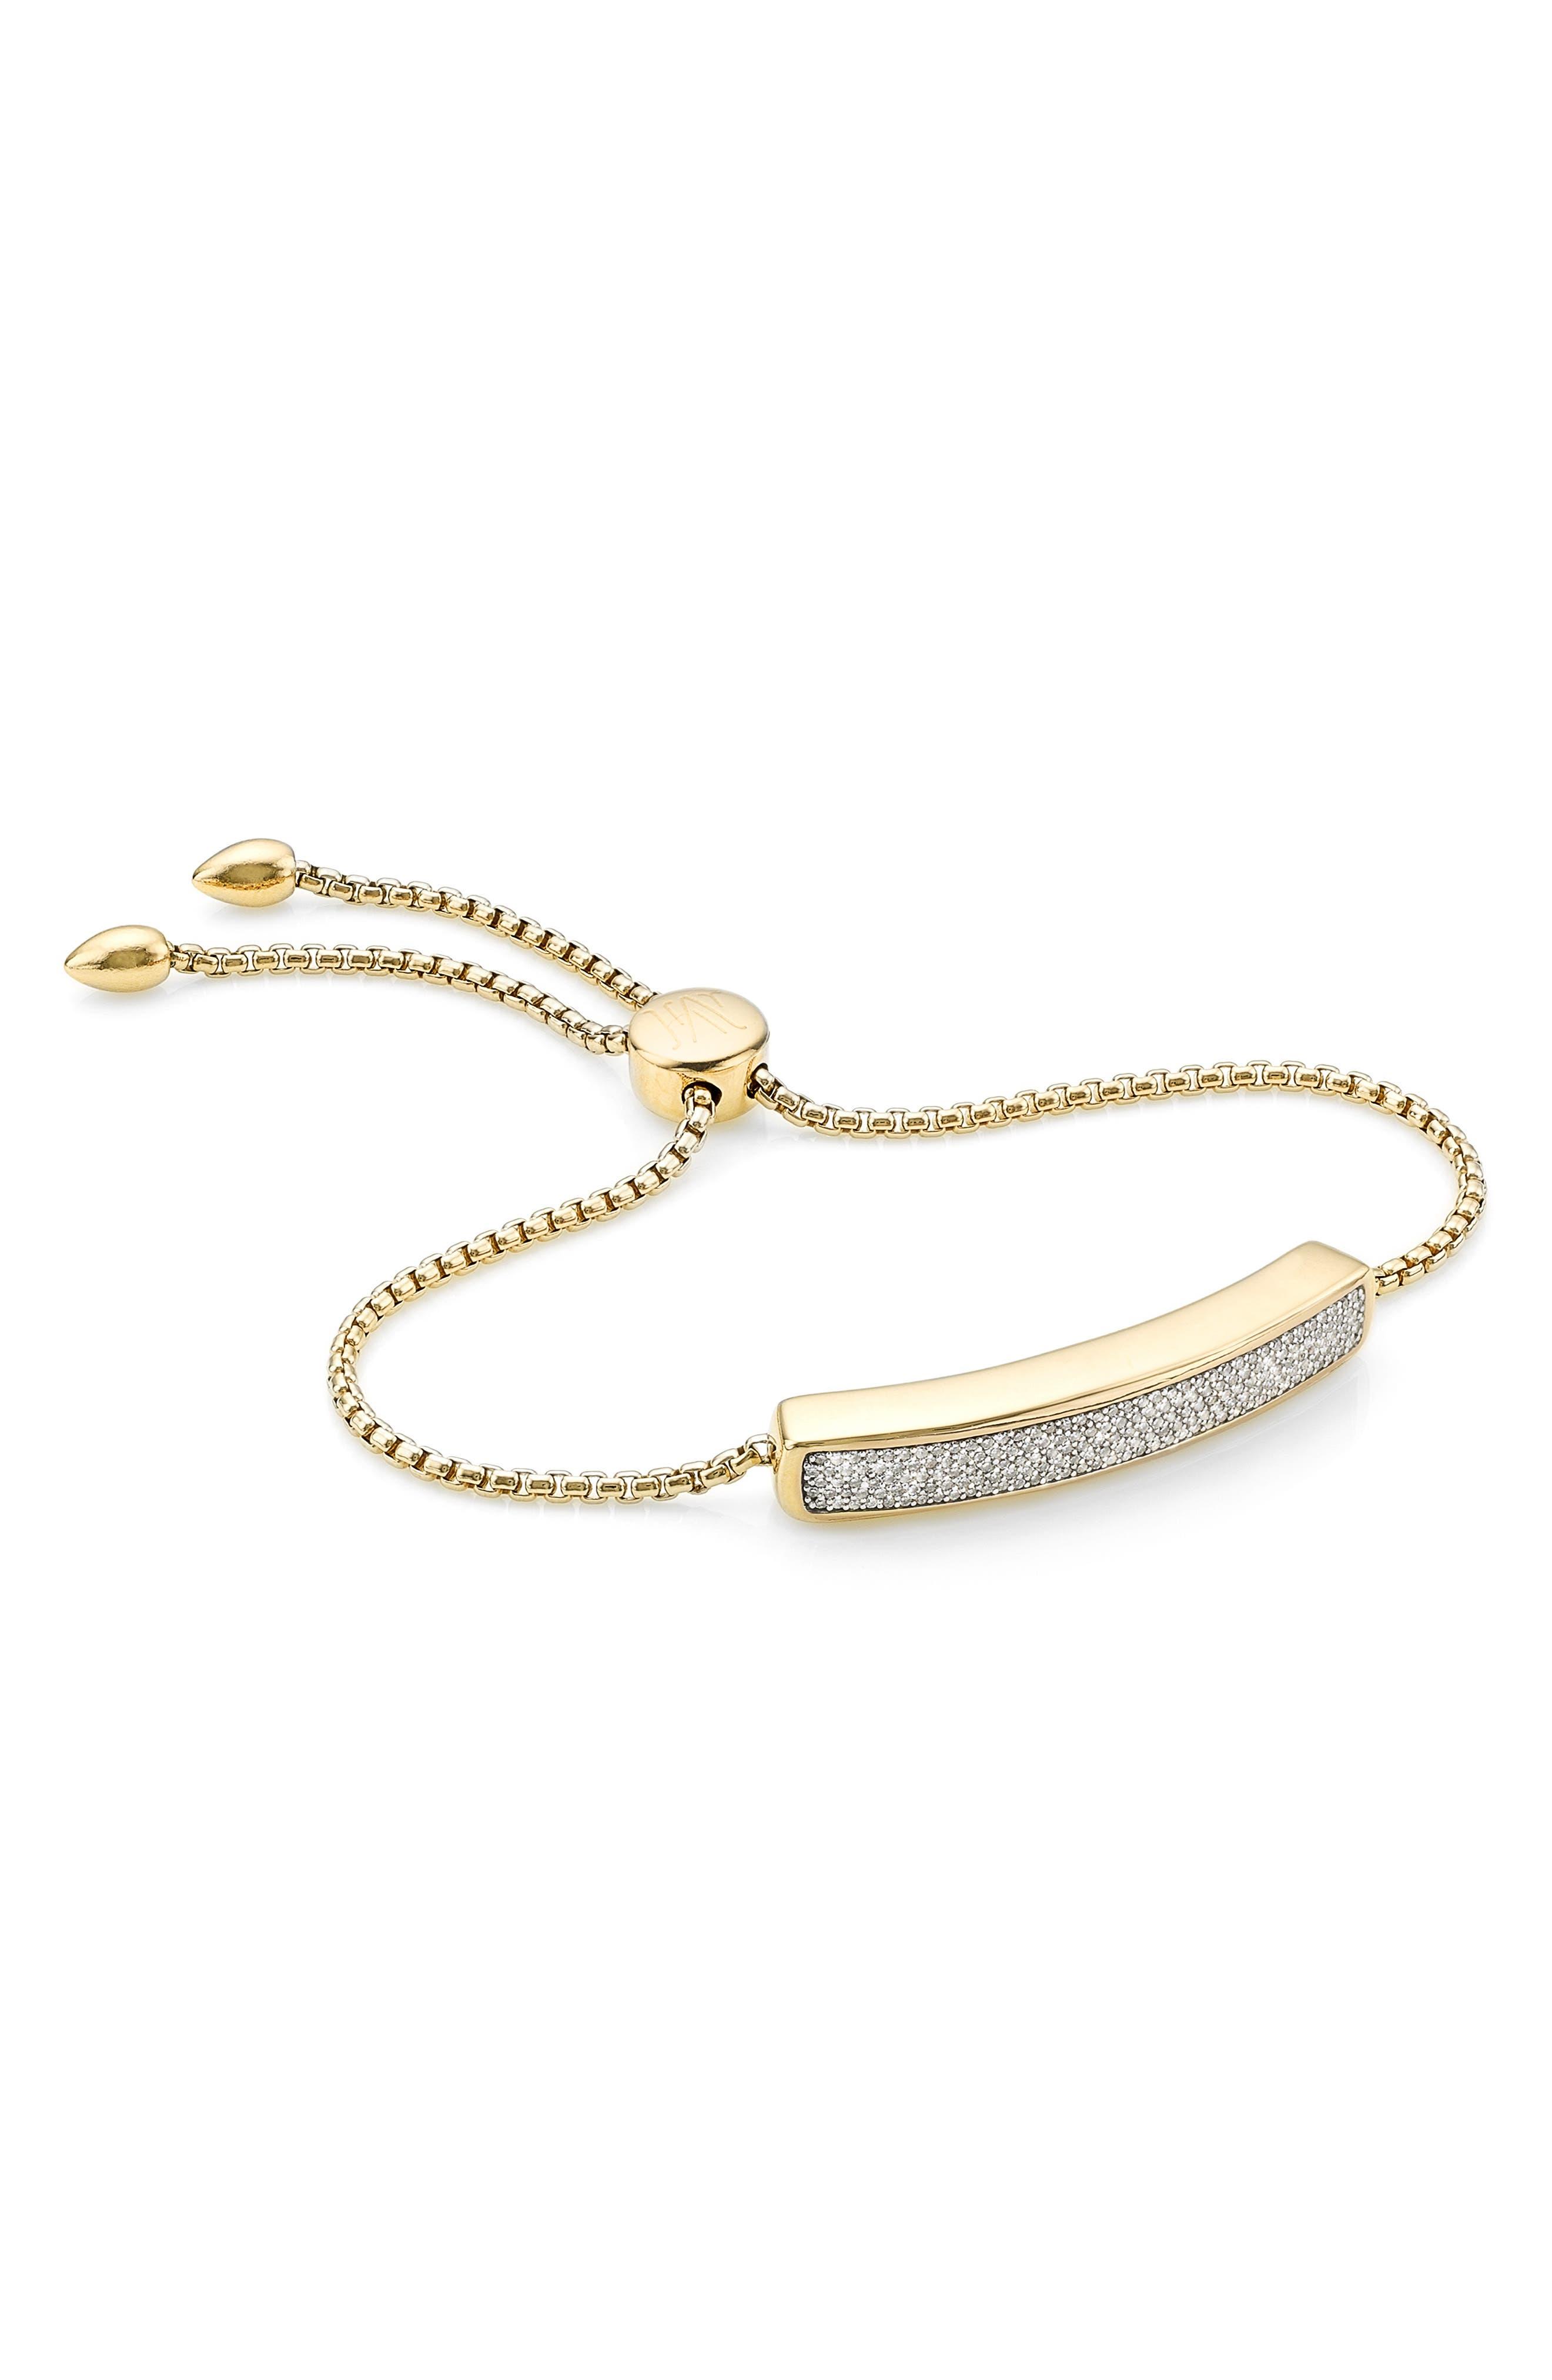 MONICA VINADER, Engravable Baja Diamond Bracelet, Main thumbnail 1, color, YELLOW GOLD/ DIAMOND